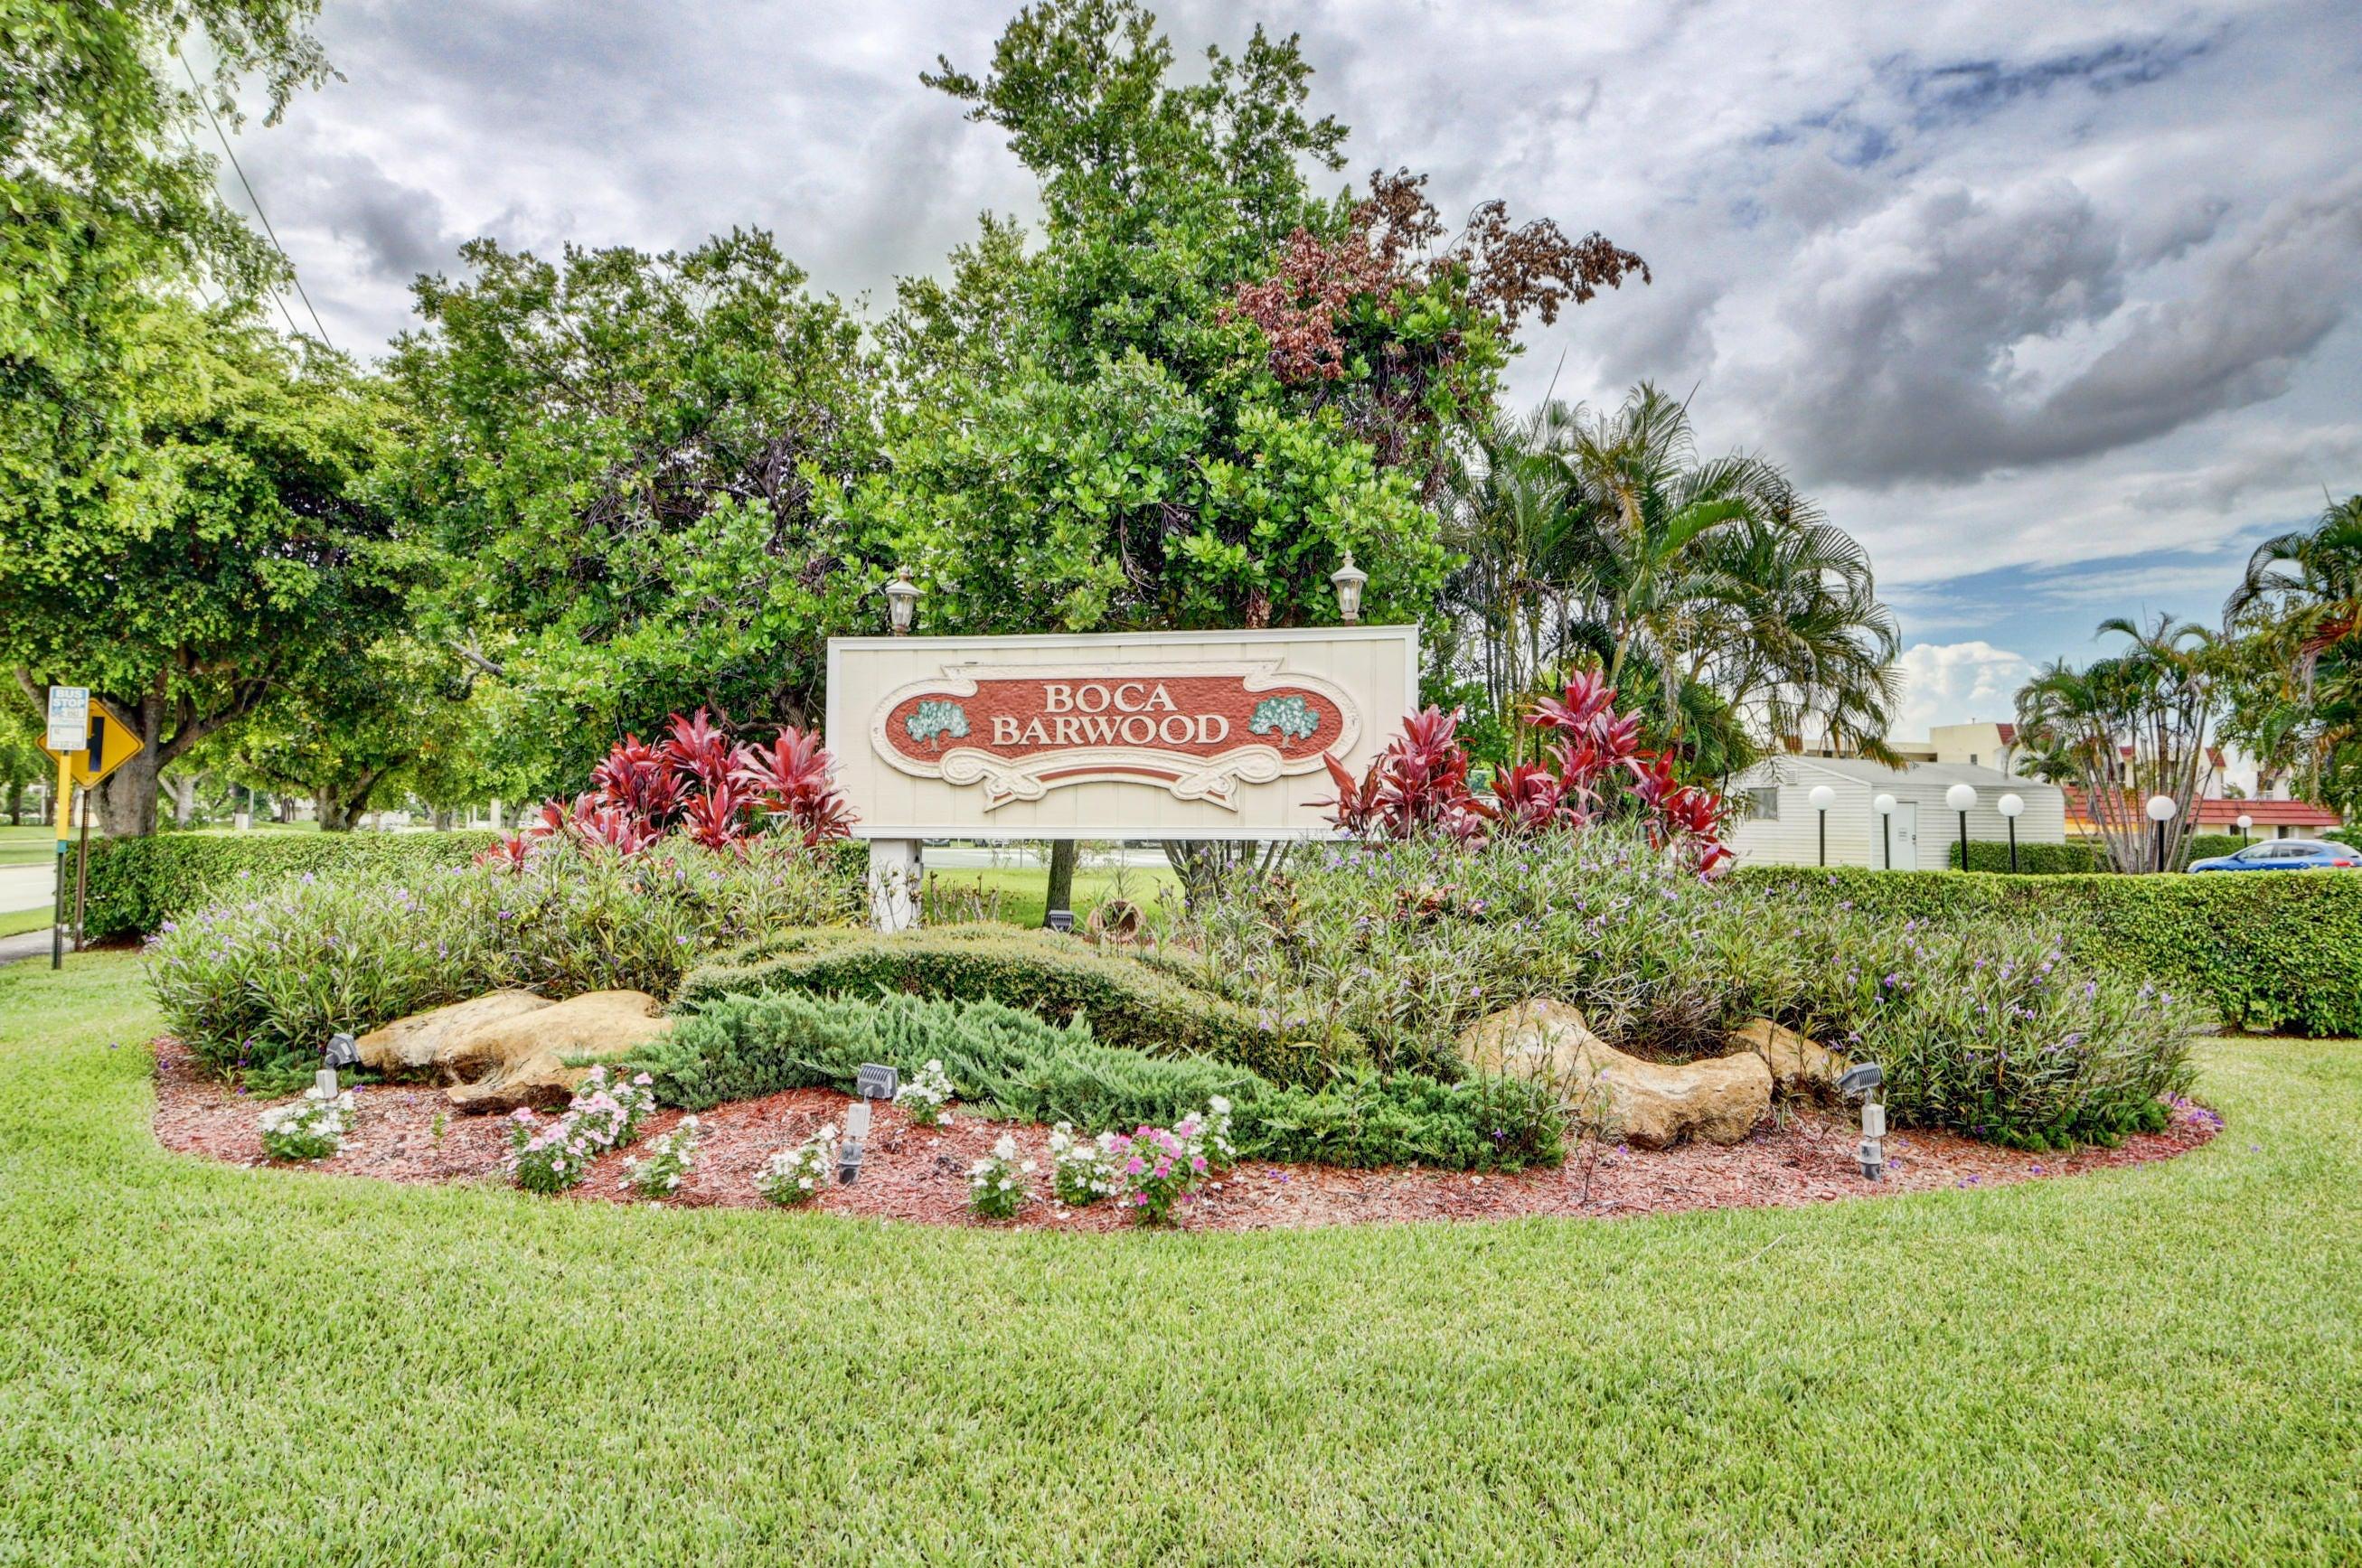 23277 Barwood Lane #408 Boca Raton, FL 33428